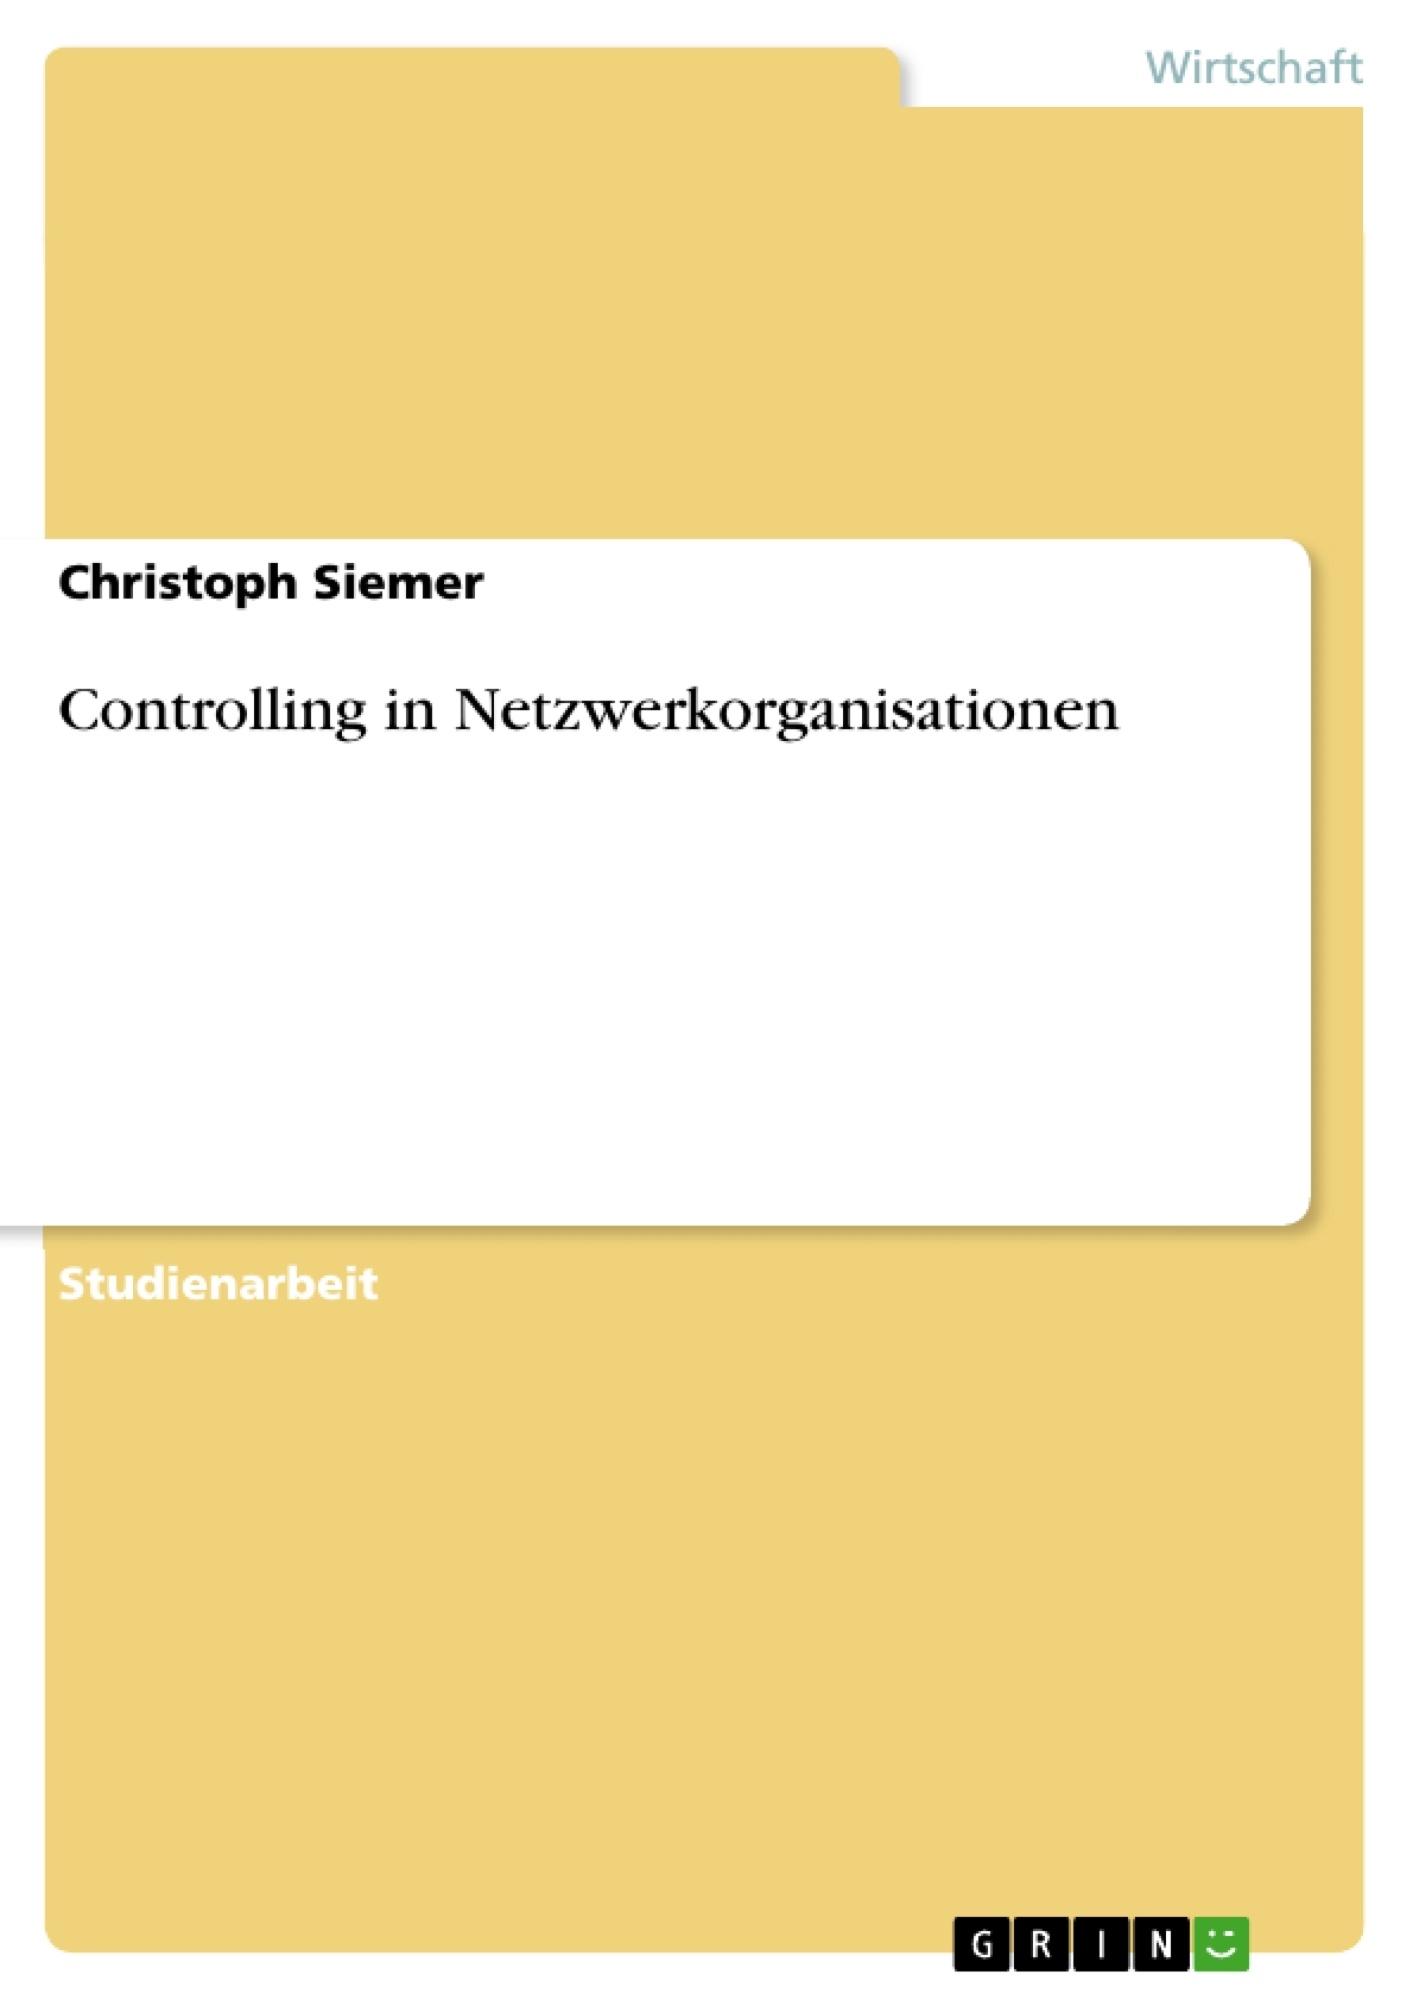 Titel: Controlling in Netzwerkorganisationen